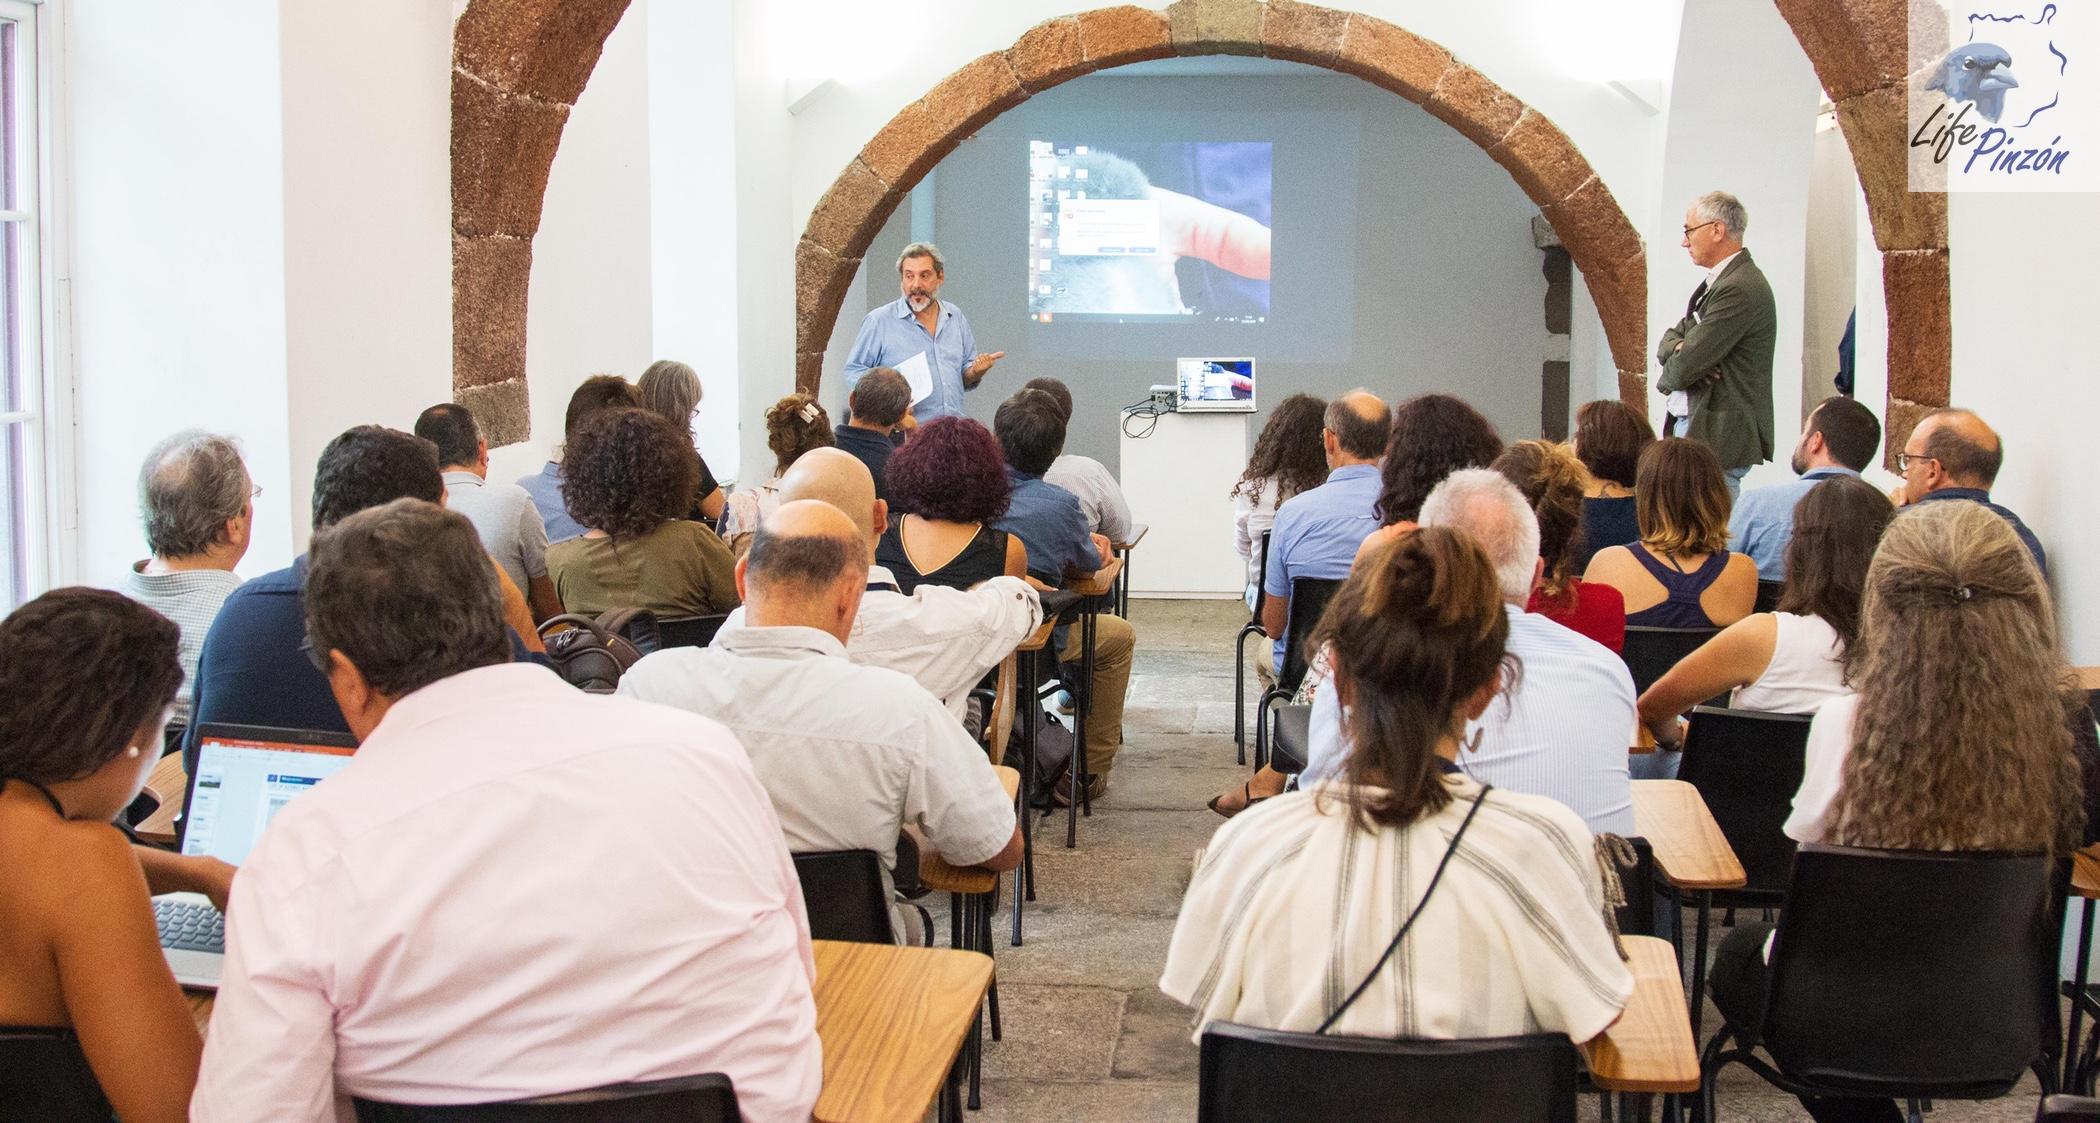 Primer Seminario de la Región Biogeográfica Macaronésica en Madeira25-28 septiembre 2018